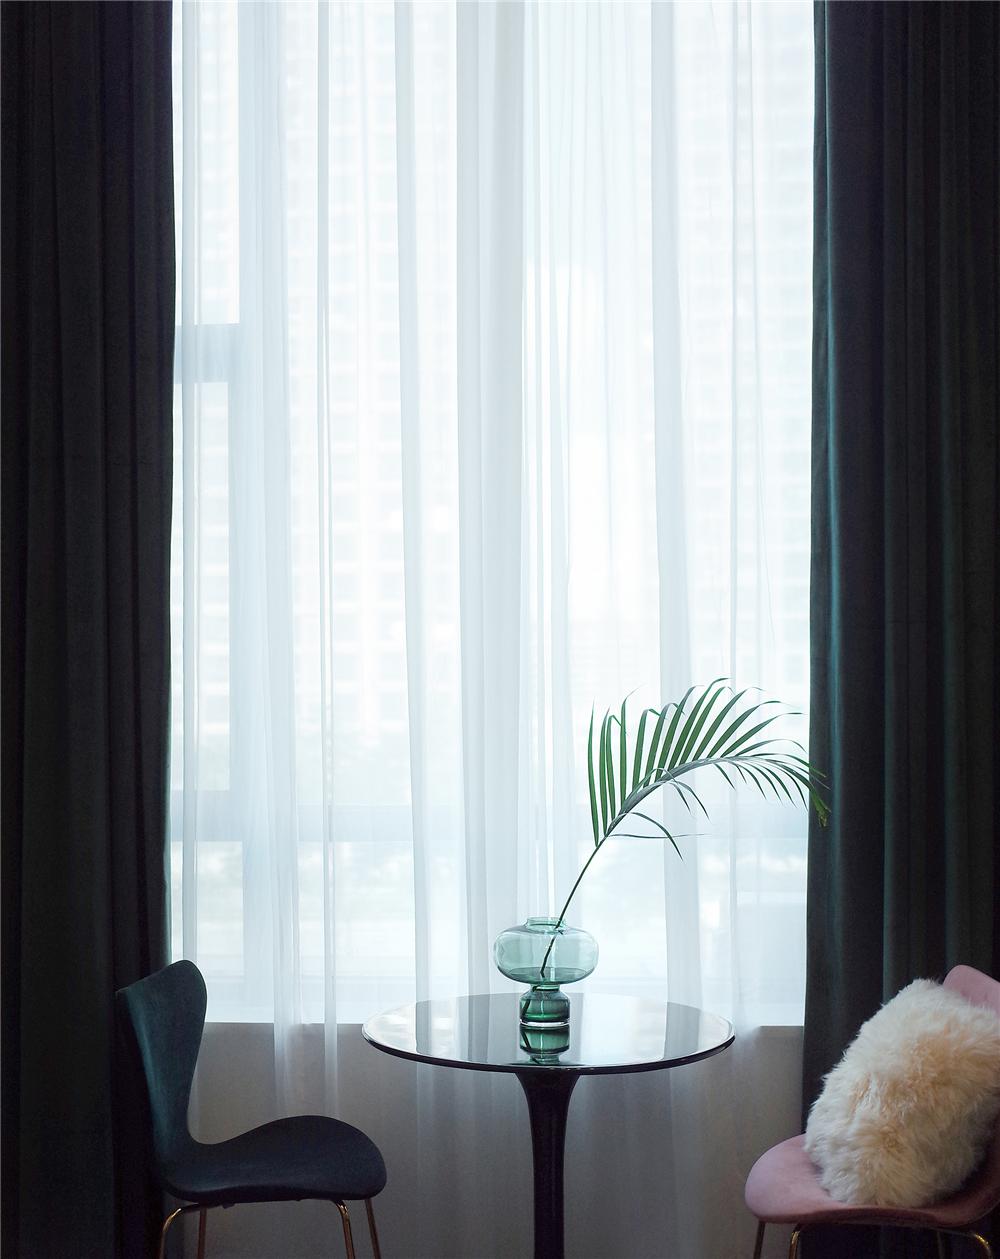 36㎡Loft轻奢风装修客厅小景